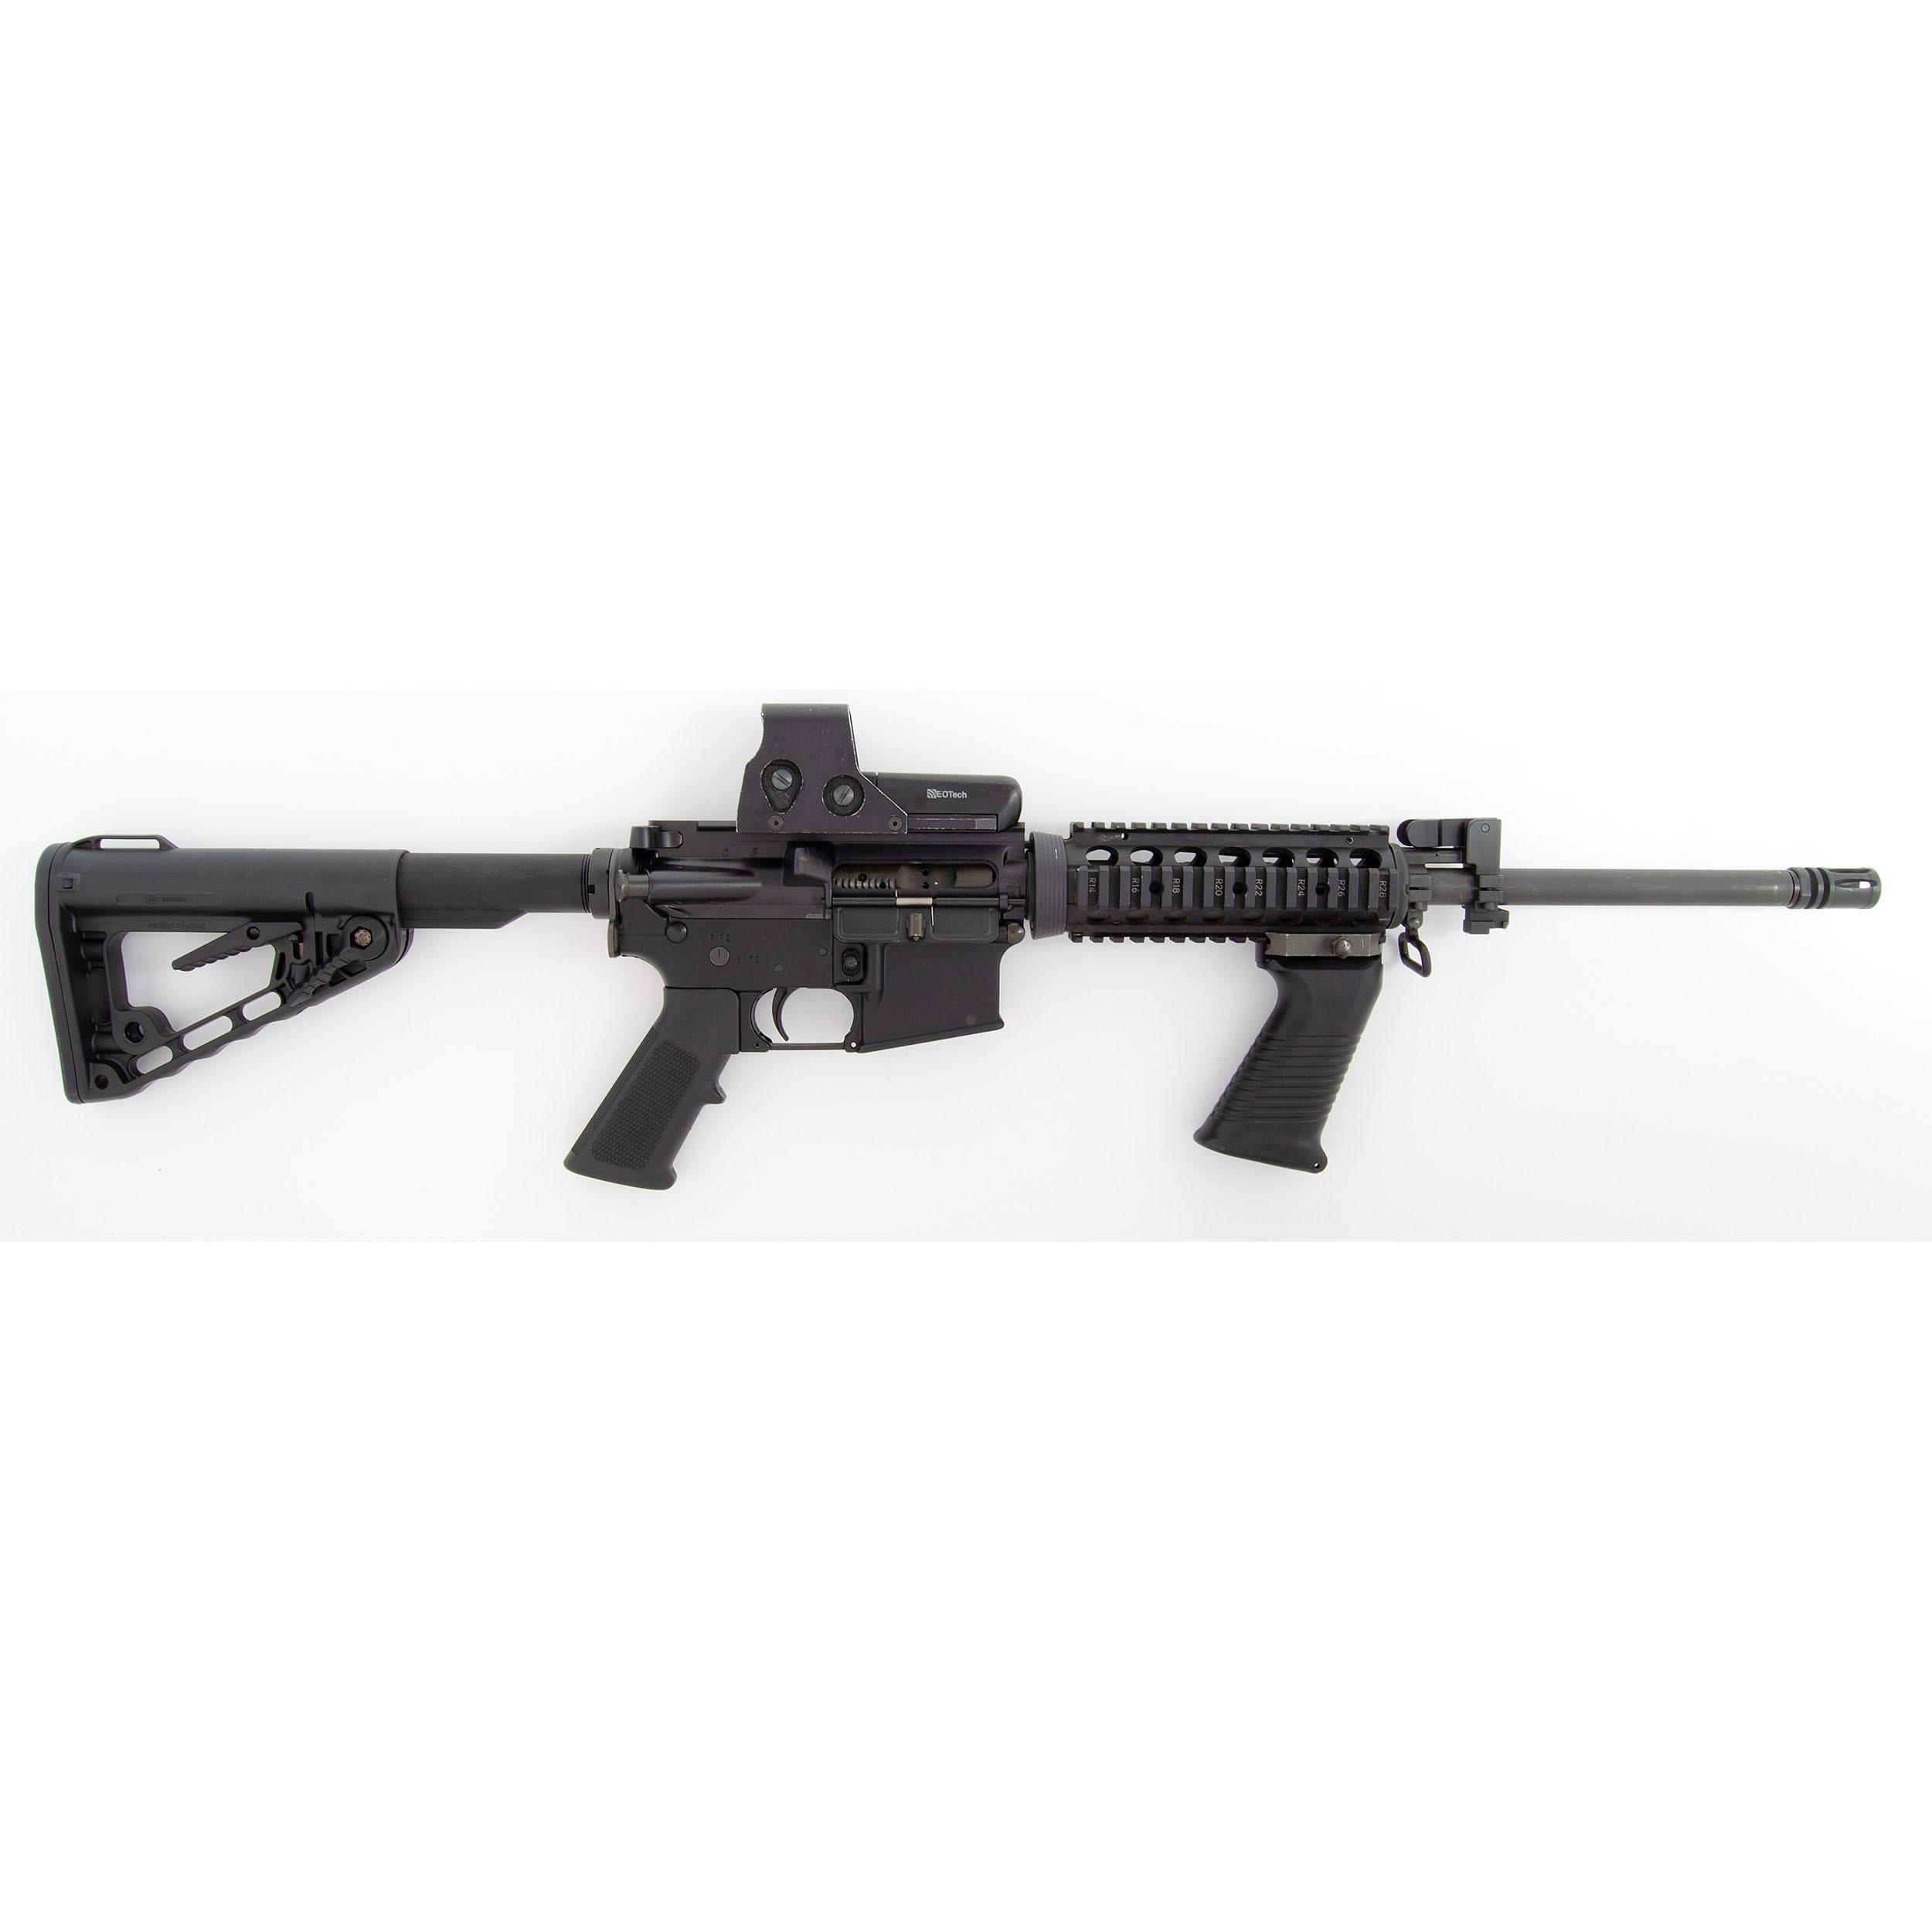 Colt M4 Carbine with EOTech Sight | Cowan's Auction House: The